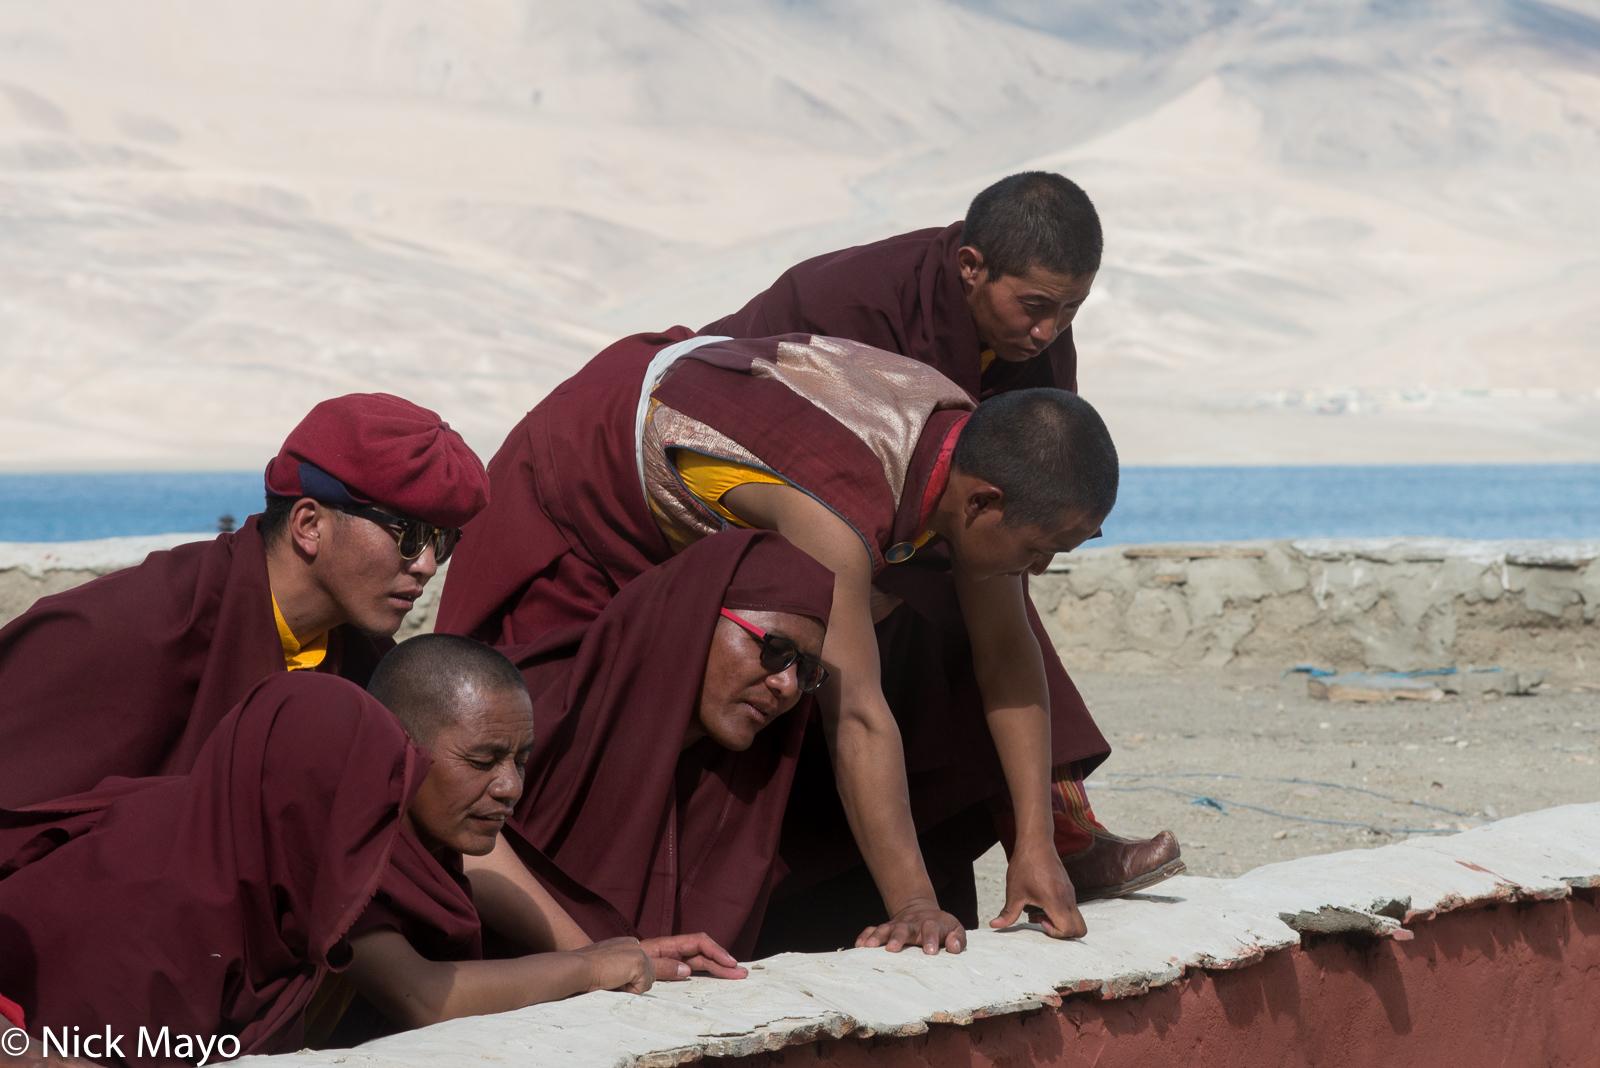 Changpa, Festival, India, Jammu & Kashmir, Monk, photo